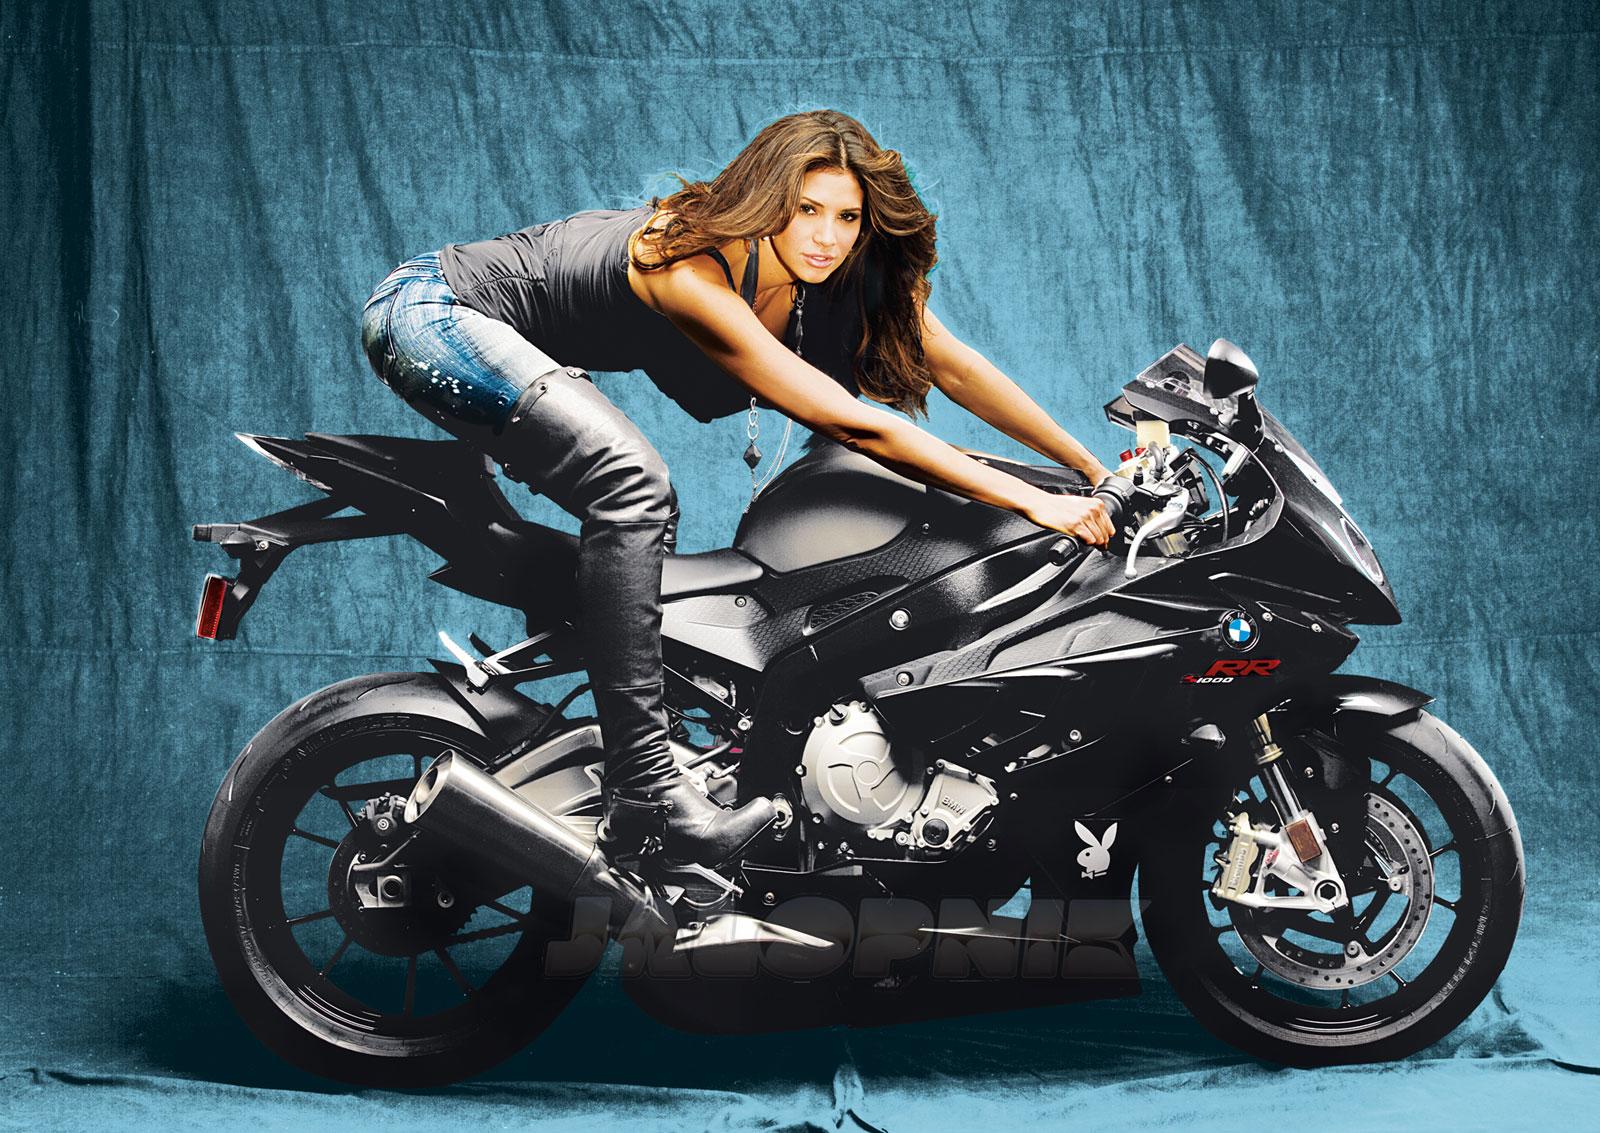 http://3.bp.blogspot.com/-2MeTndEs0sU/TZyA0i4lHZI/AAAAAAAAANM/x-7AVFCCwFc/s1600/BMW+S1000RR+Girl.jpg